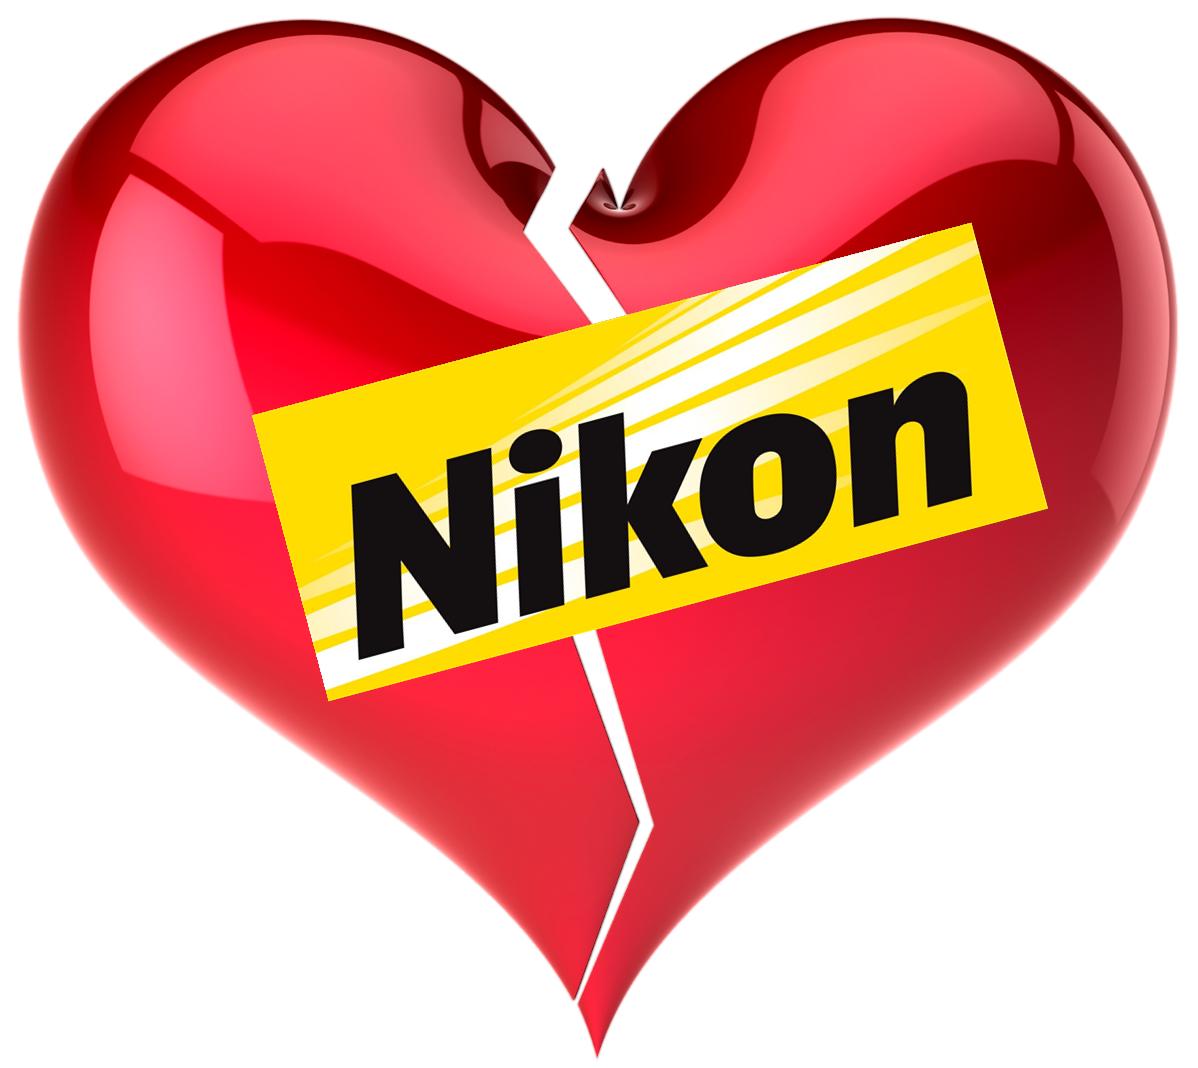 Am I Next? Nikon plant closing; decline in digital single lens reflex cameras (DSLR)